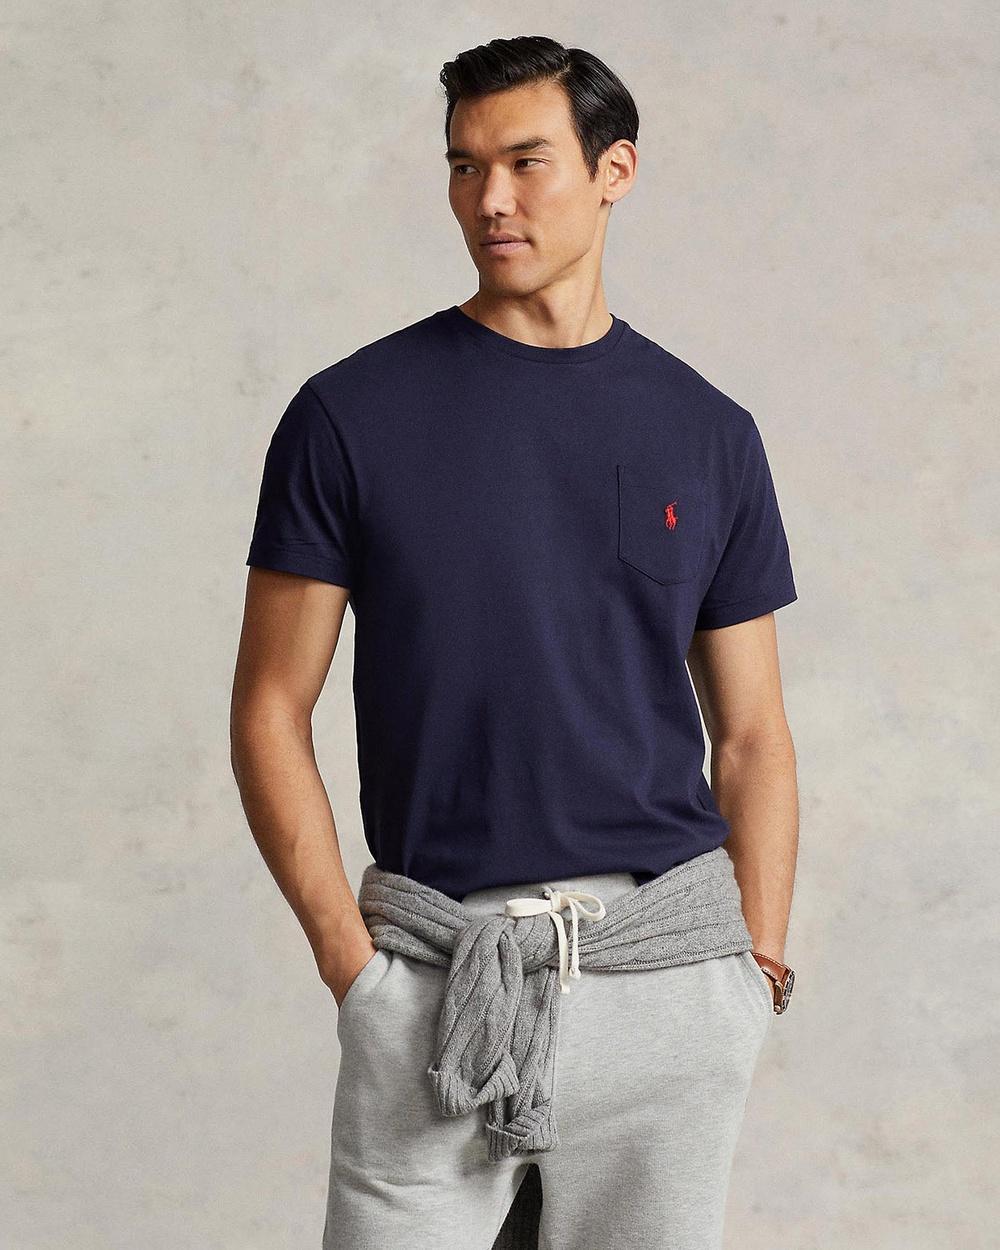 Polo Ralph Lauren - Classic Fit Crew Neck Pocket Tee - T-Shirts & Singlets (Navy) Classic Fit Crew Neck Pocket Tee